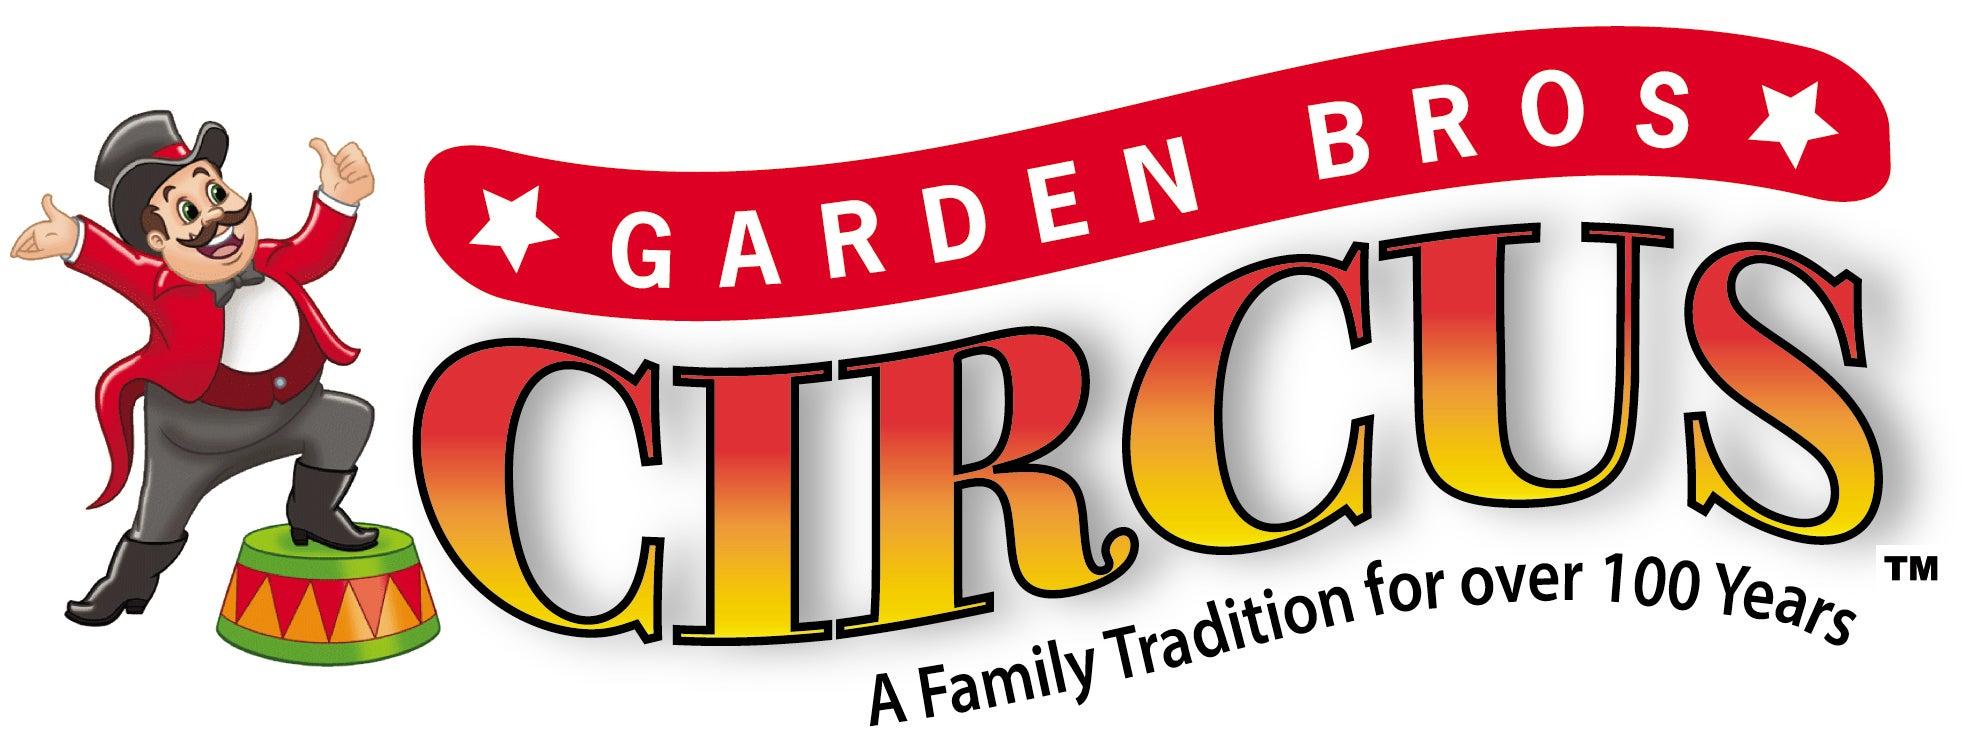 Garden Bros Logo 4c.jpg